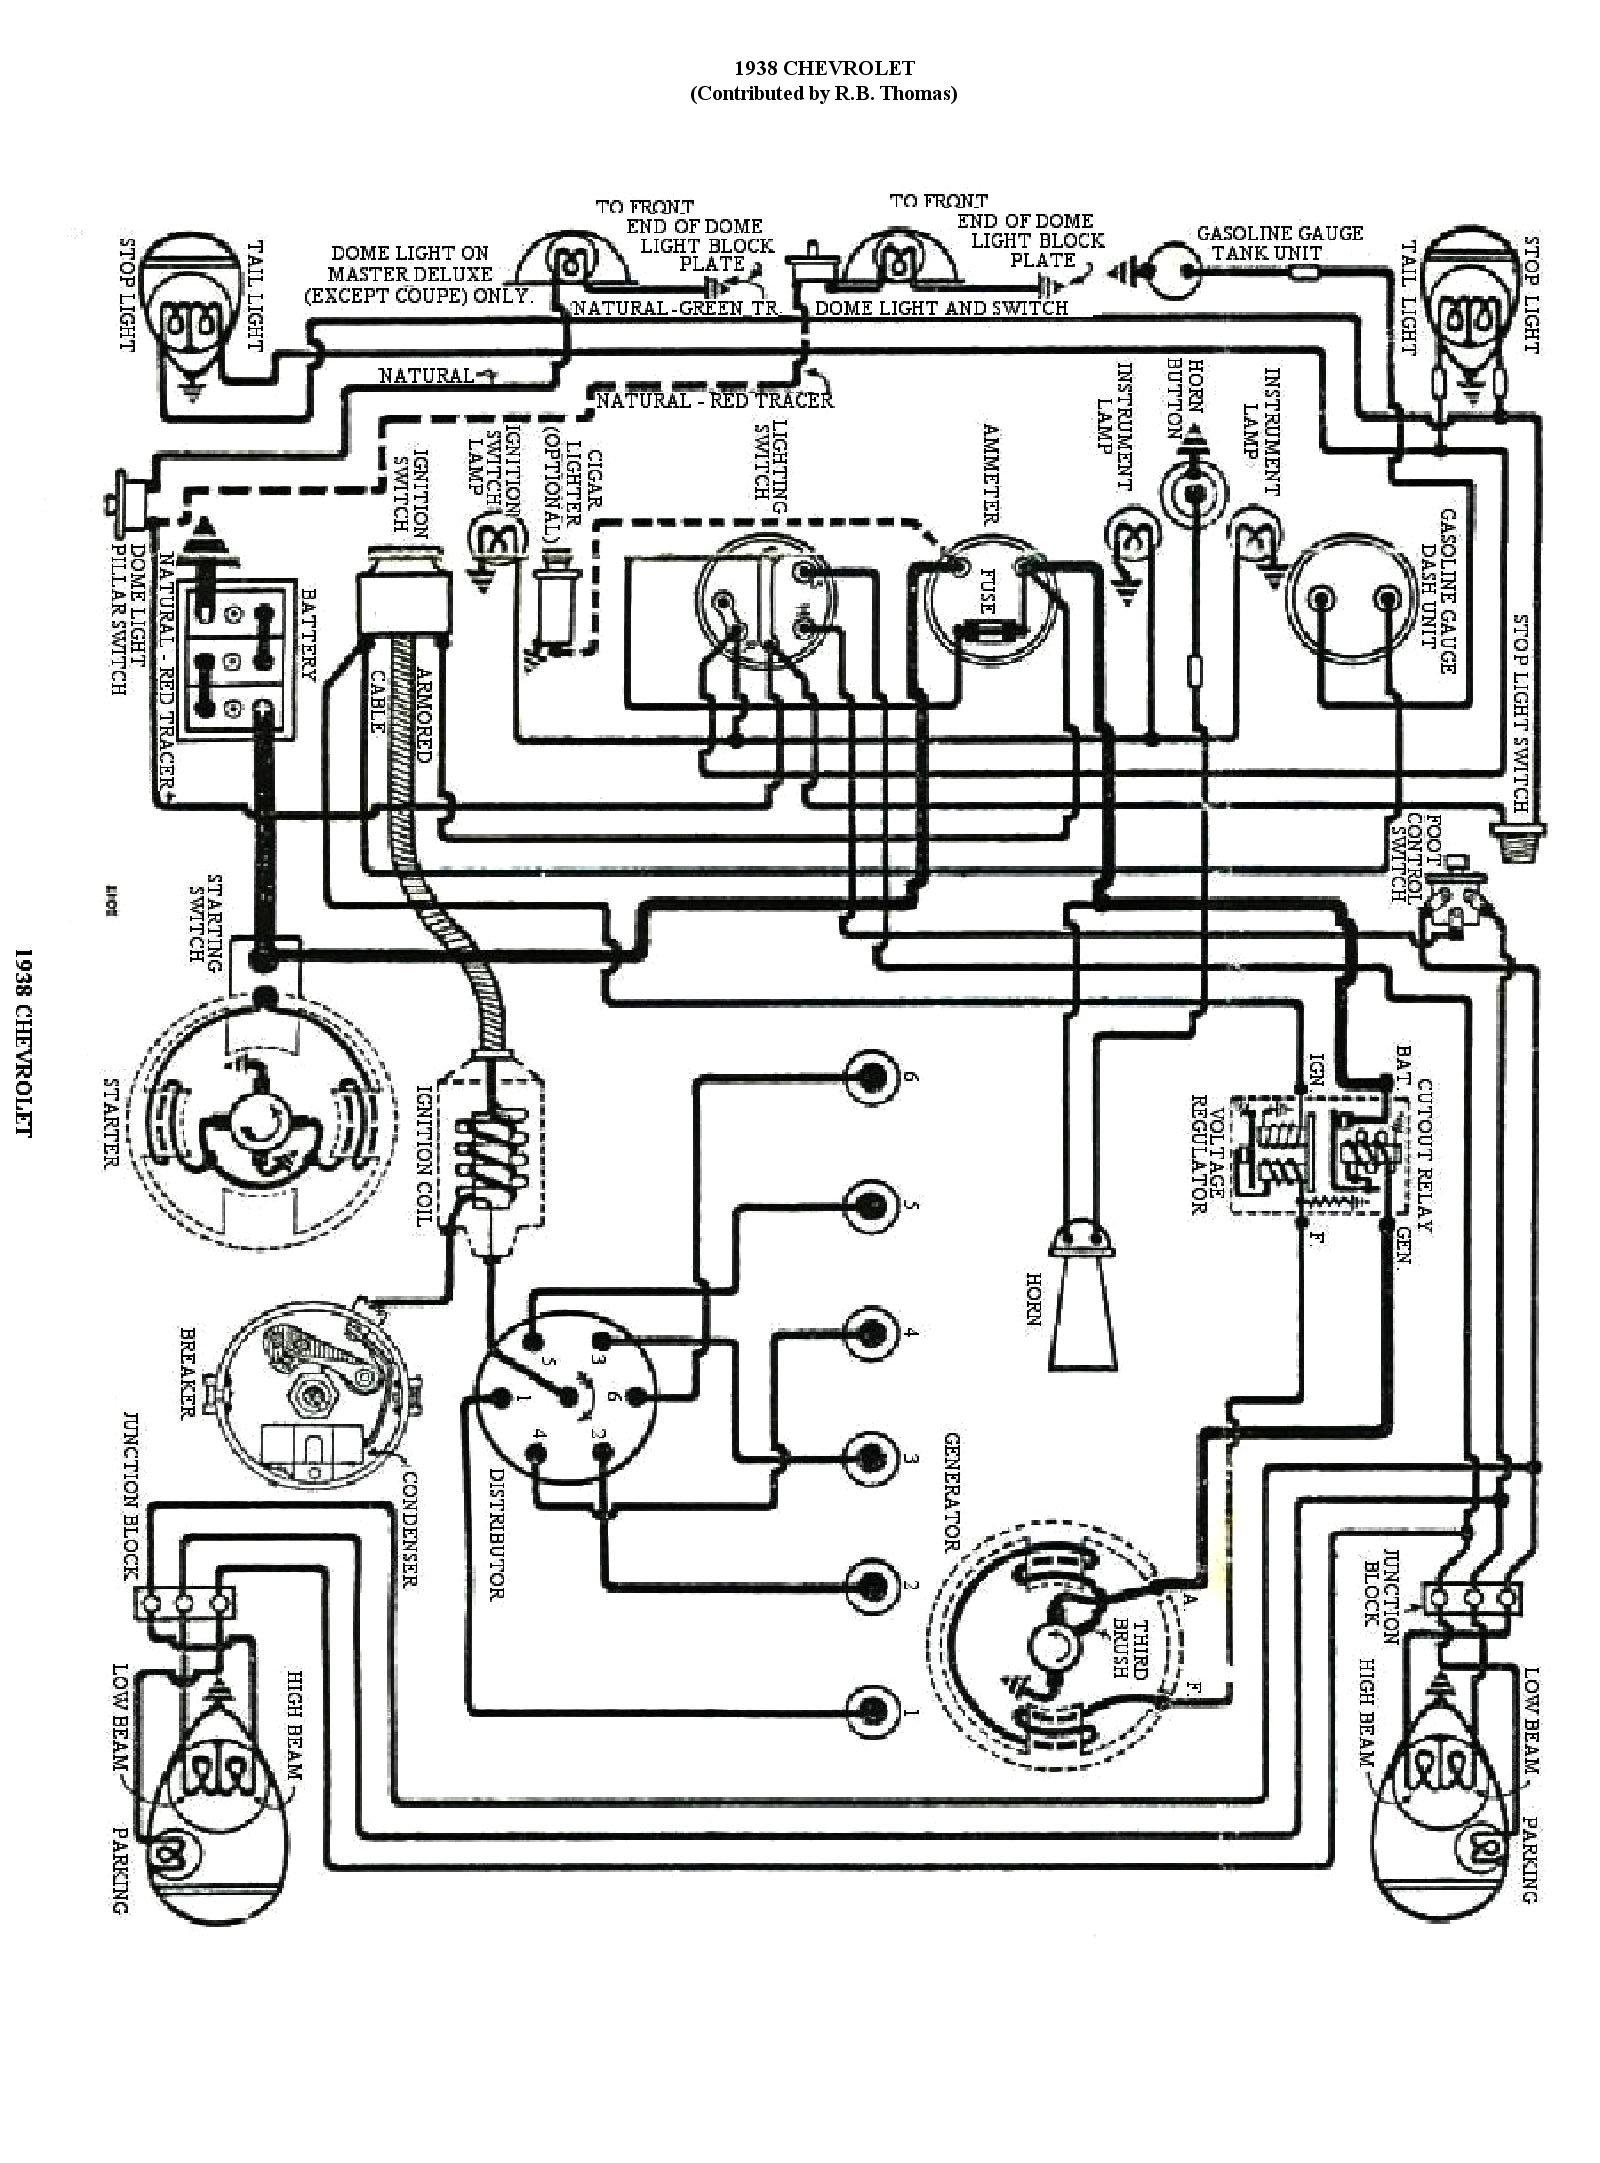 [OD_2025] 1937 Plymouth Wiring Diagram Free Diagram